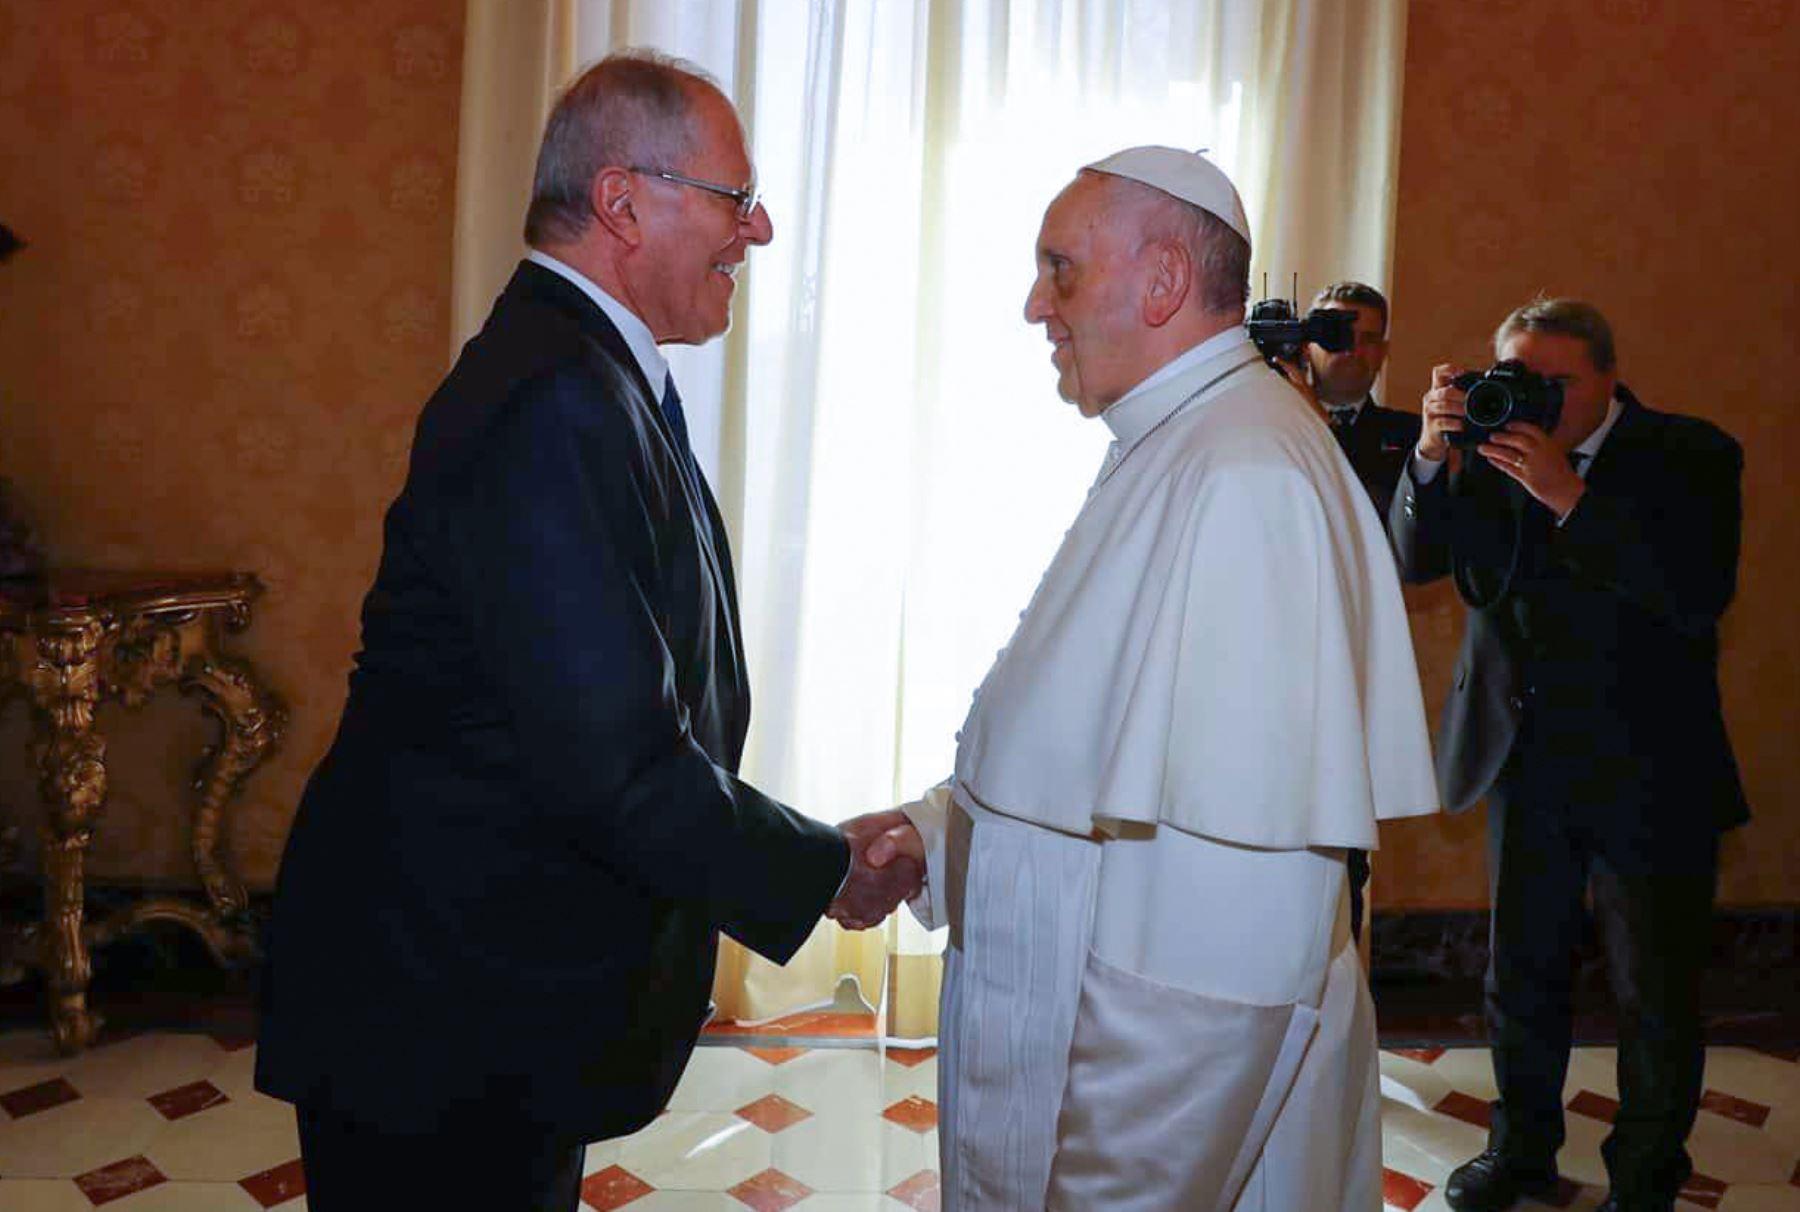 Presidente Pedro Pablo Kuczynski saluda al papa Francisco en Roma. ANDINA/Prensa Presidencia